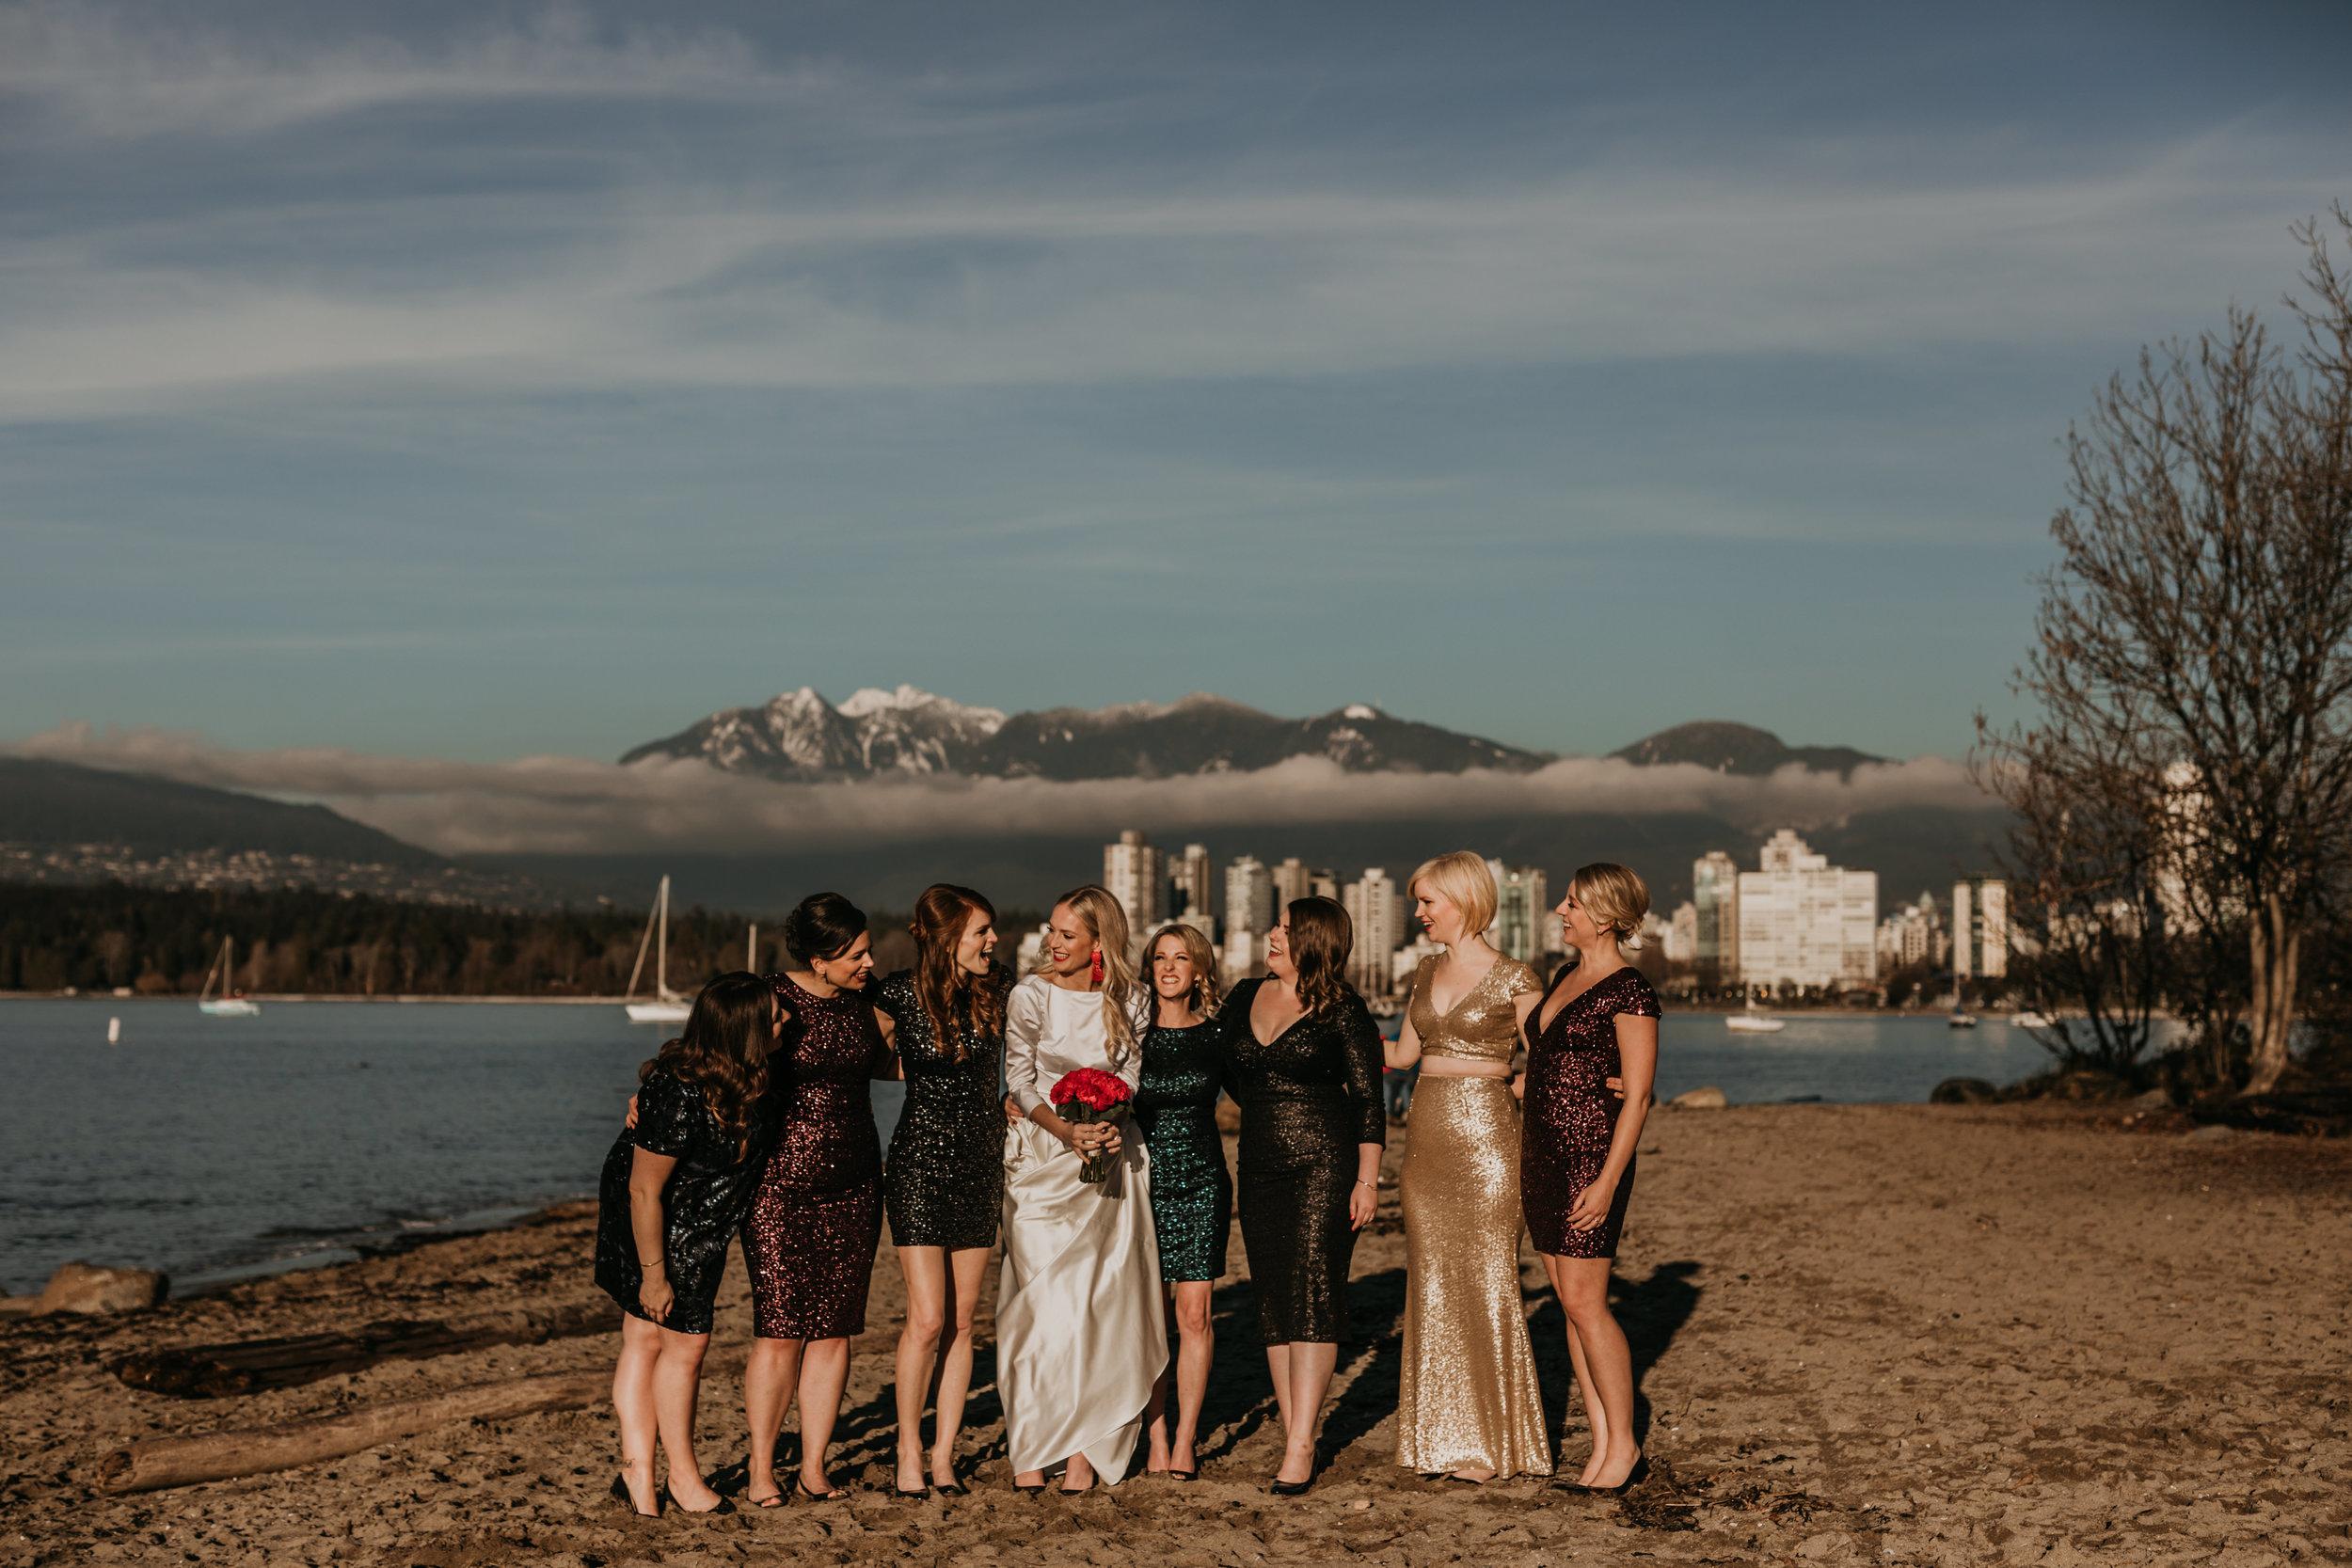 Vancouver Wedding Photos - Vegan Wedding Photographer - New Years Eve Wedding Photos - Vancouver Wedding Photographer - Vancouver Wedding Videographer - 441.JPG